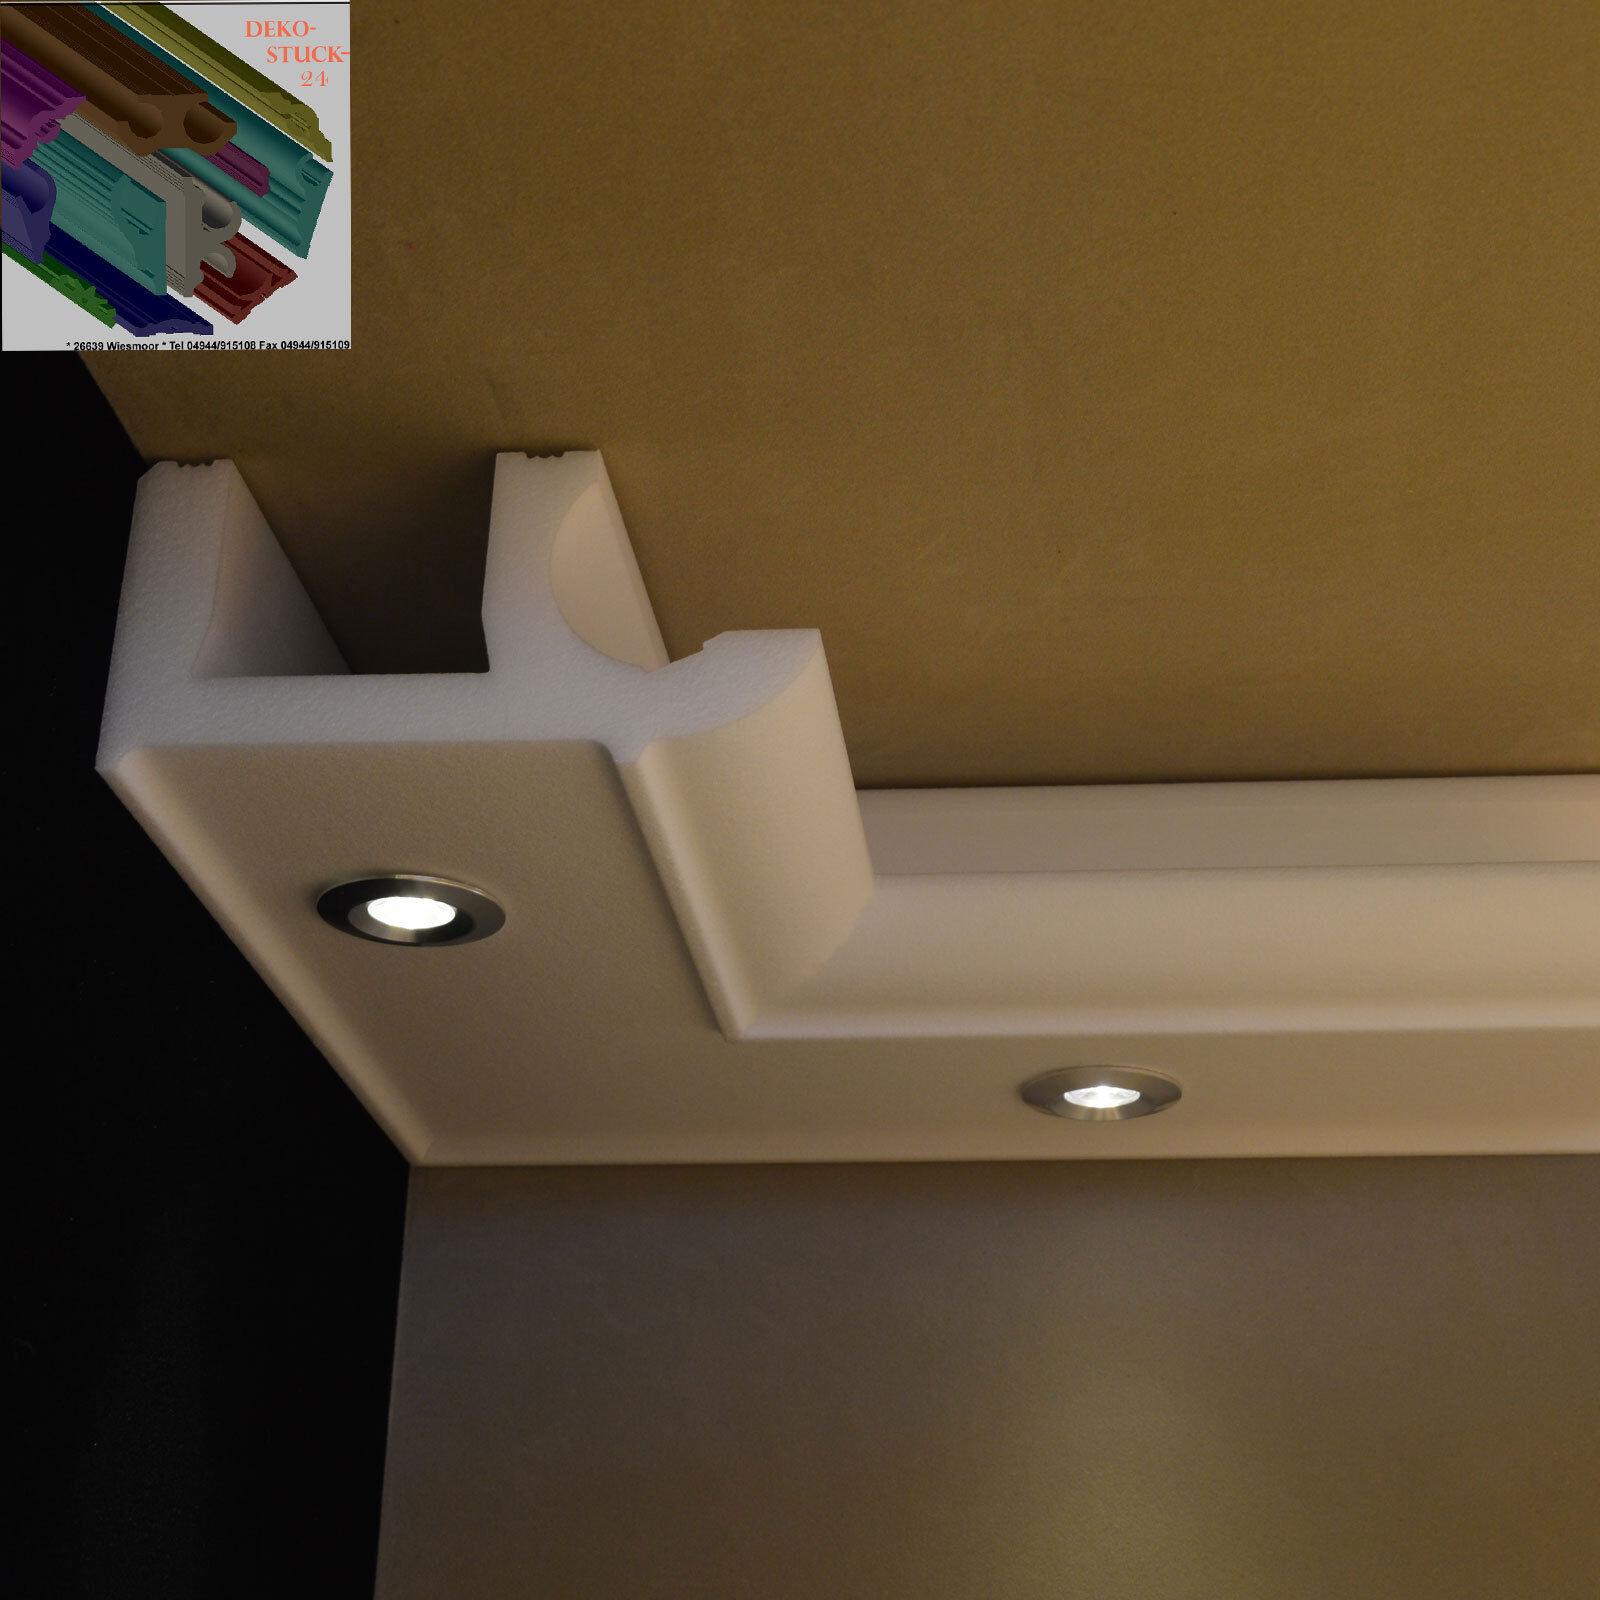 Stuckleisten LED Beleuchtung Stuckprofil Tjorben 137x70mm 10 Meter+4 Innenecken